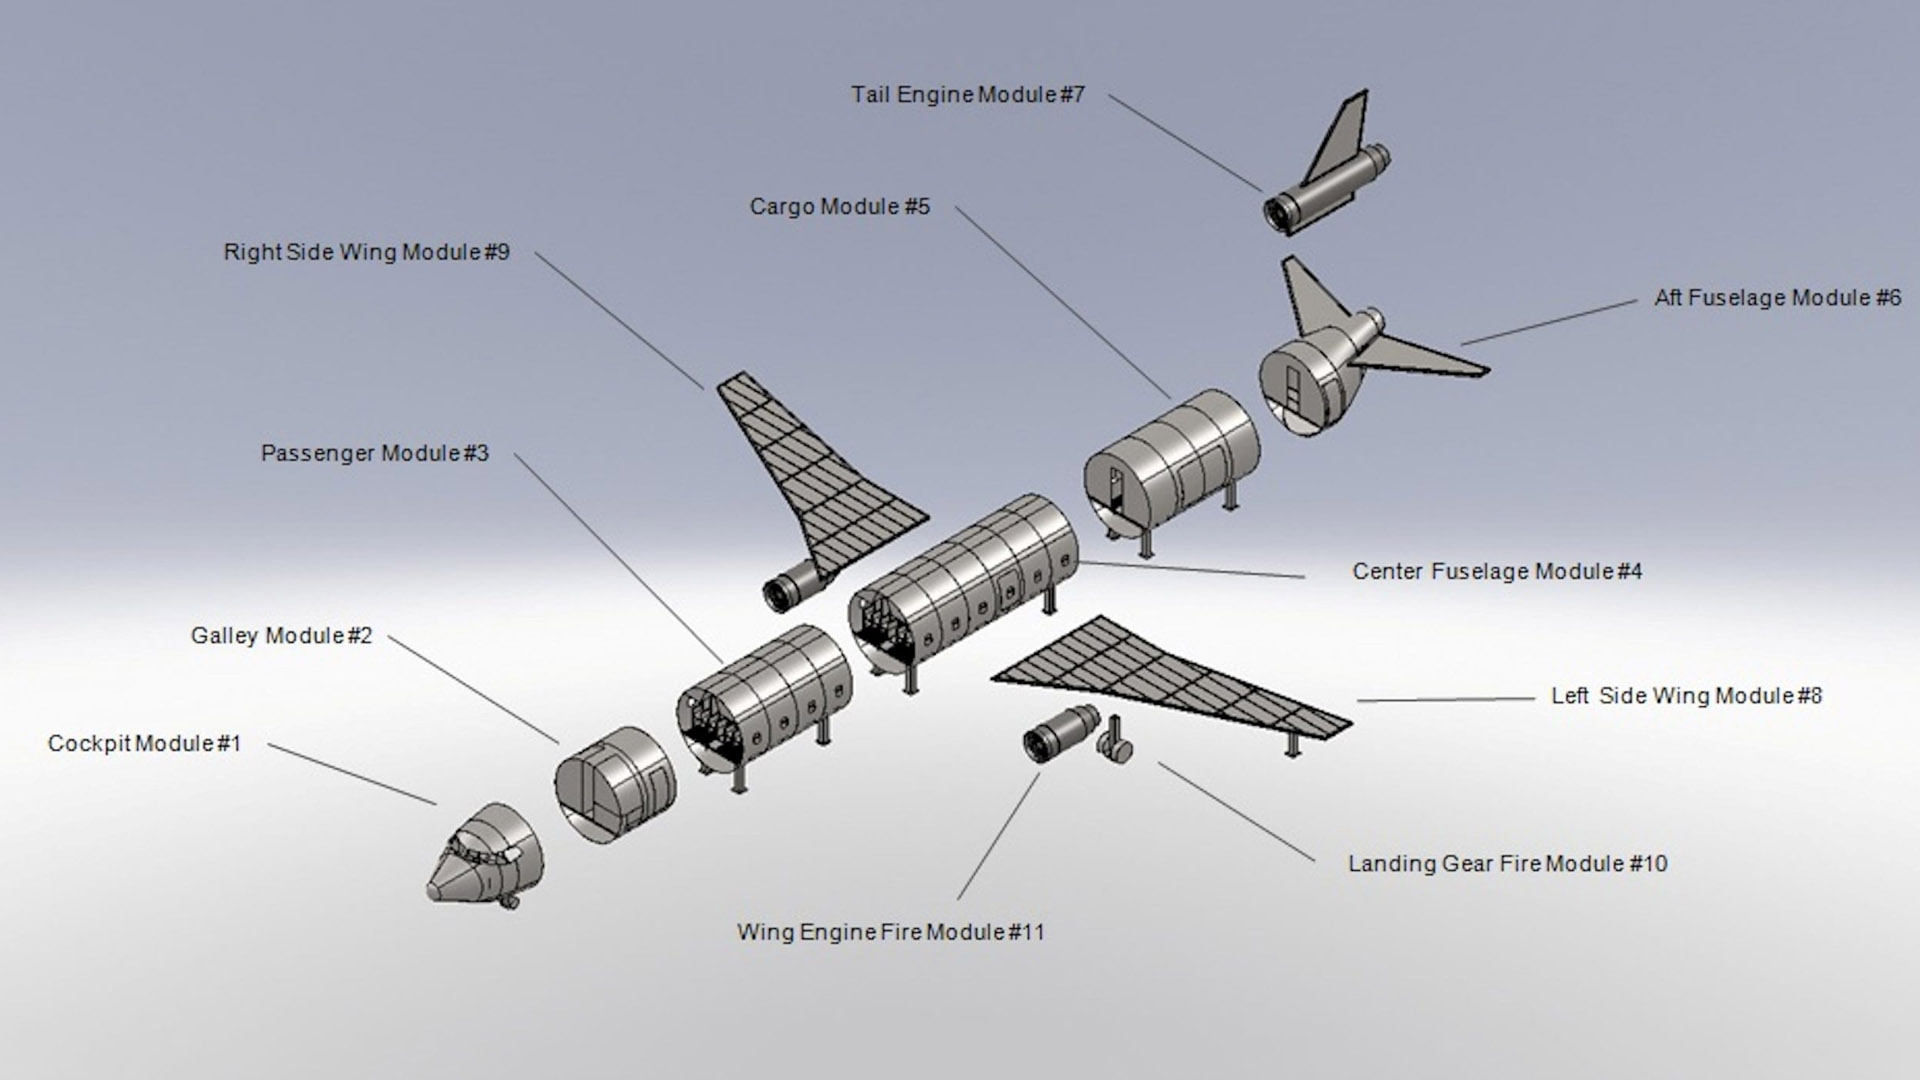 Modular design by Fireblast